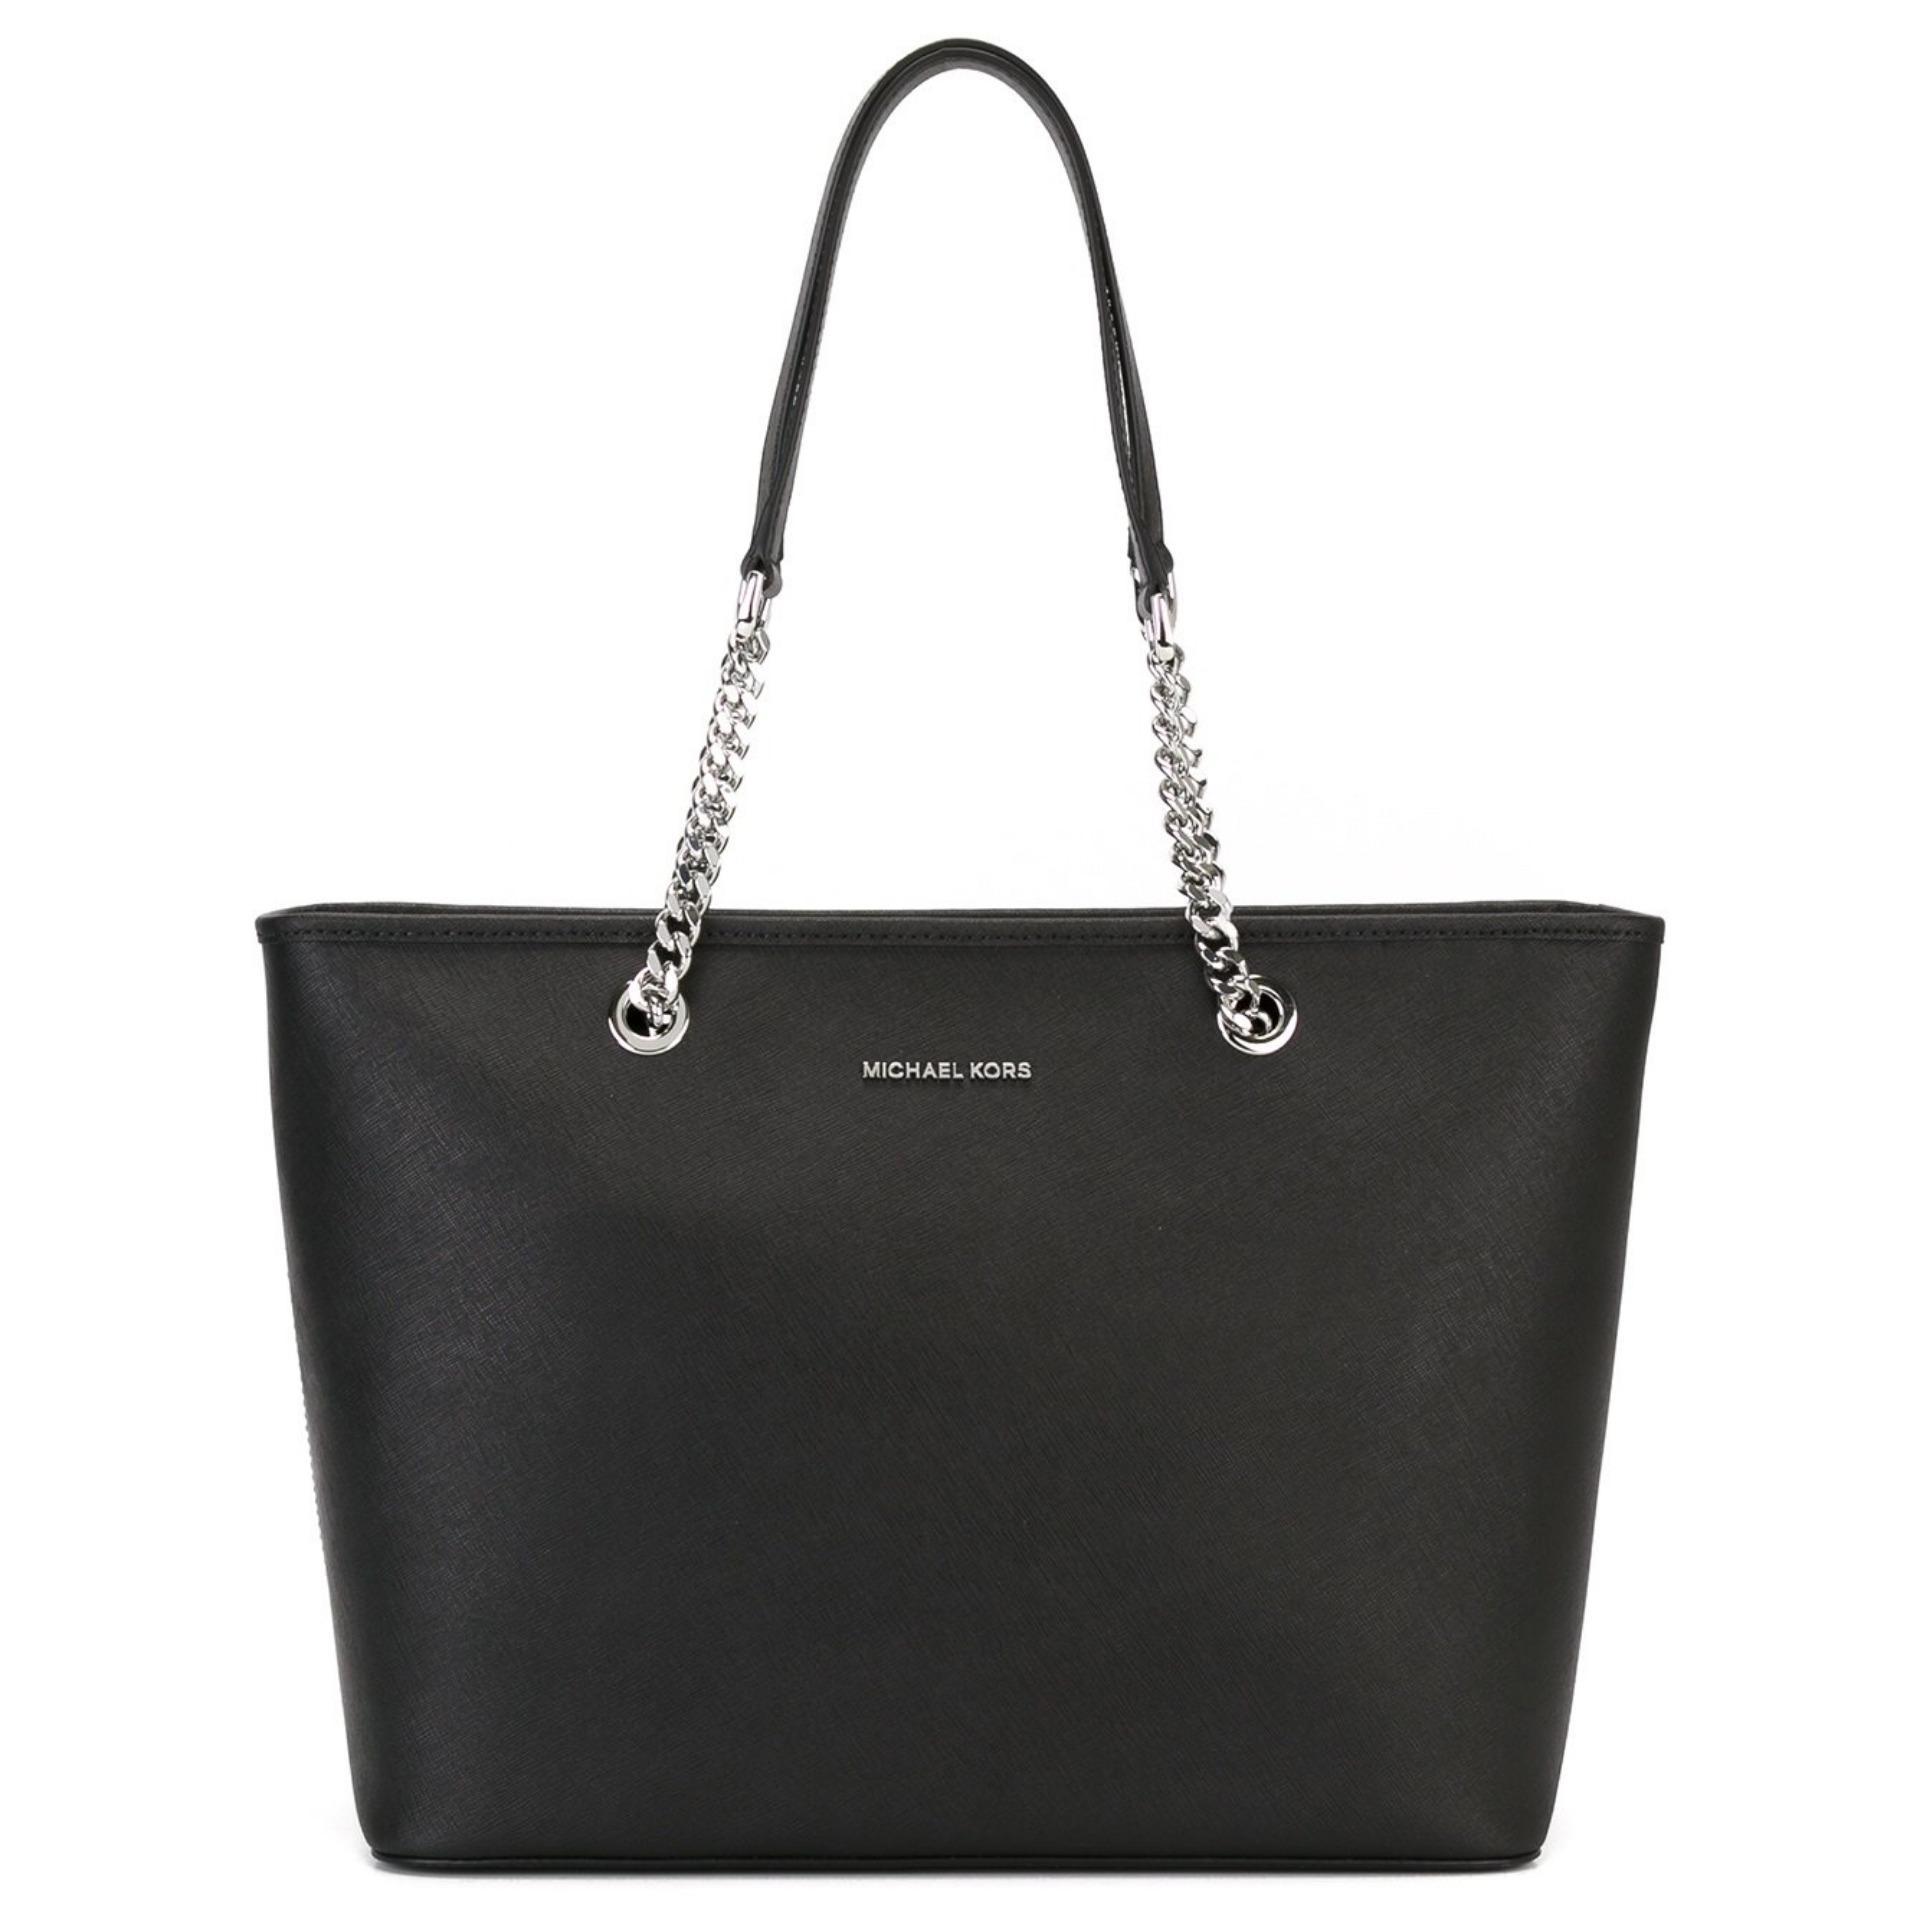 cf7e4b4ff5a4 Buy Women Michael kors Bags